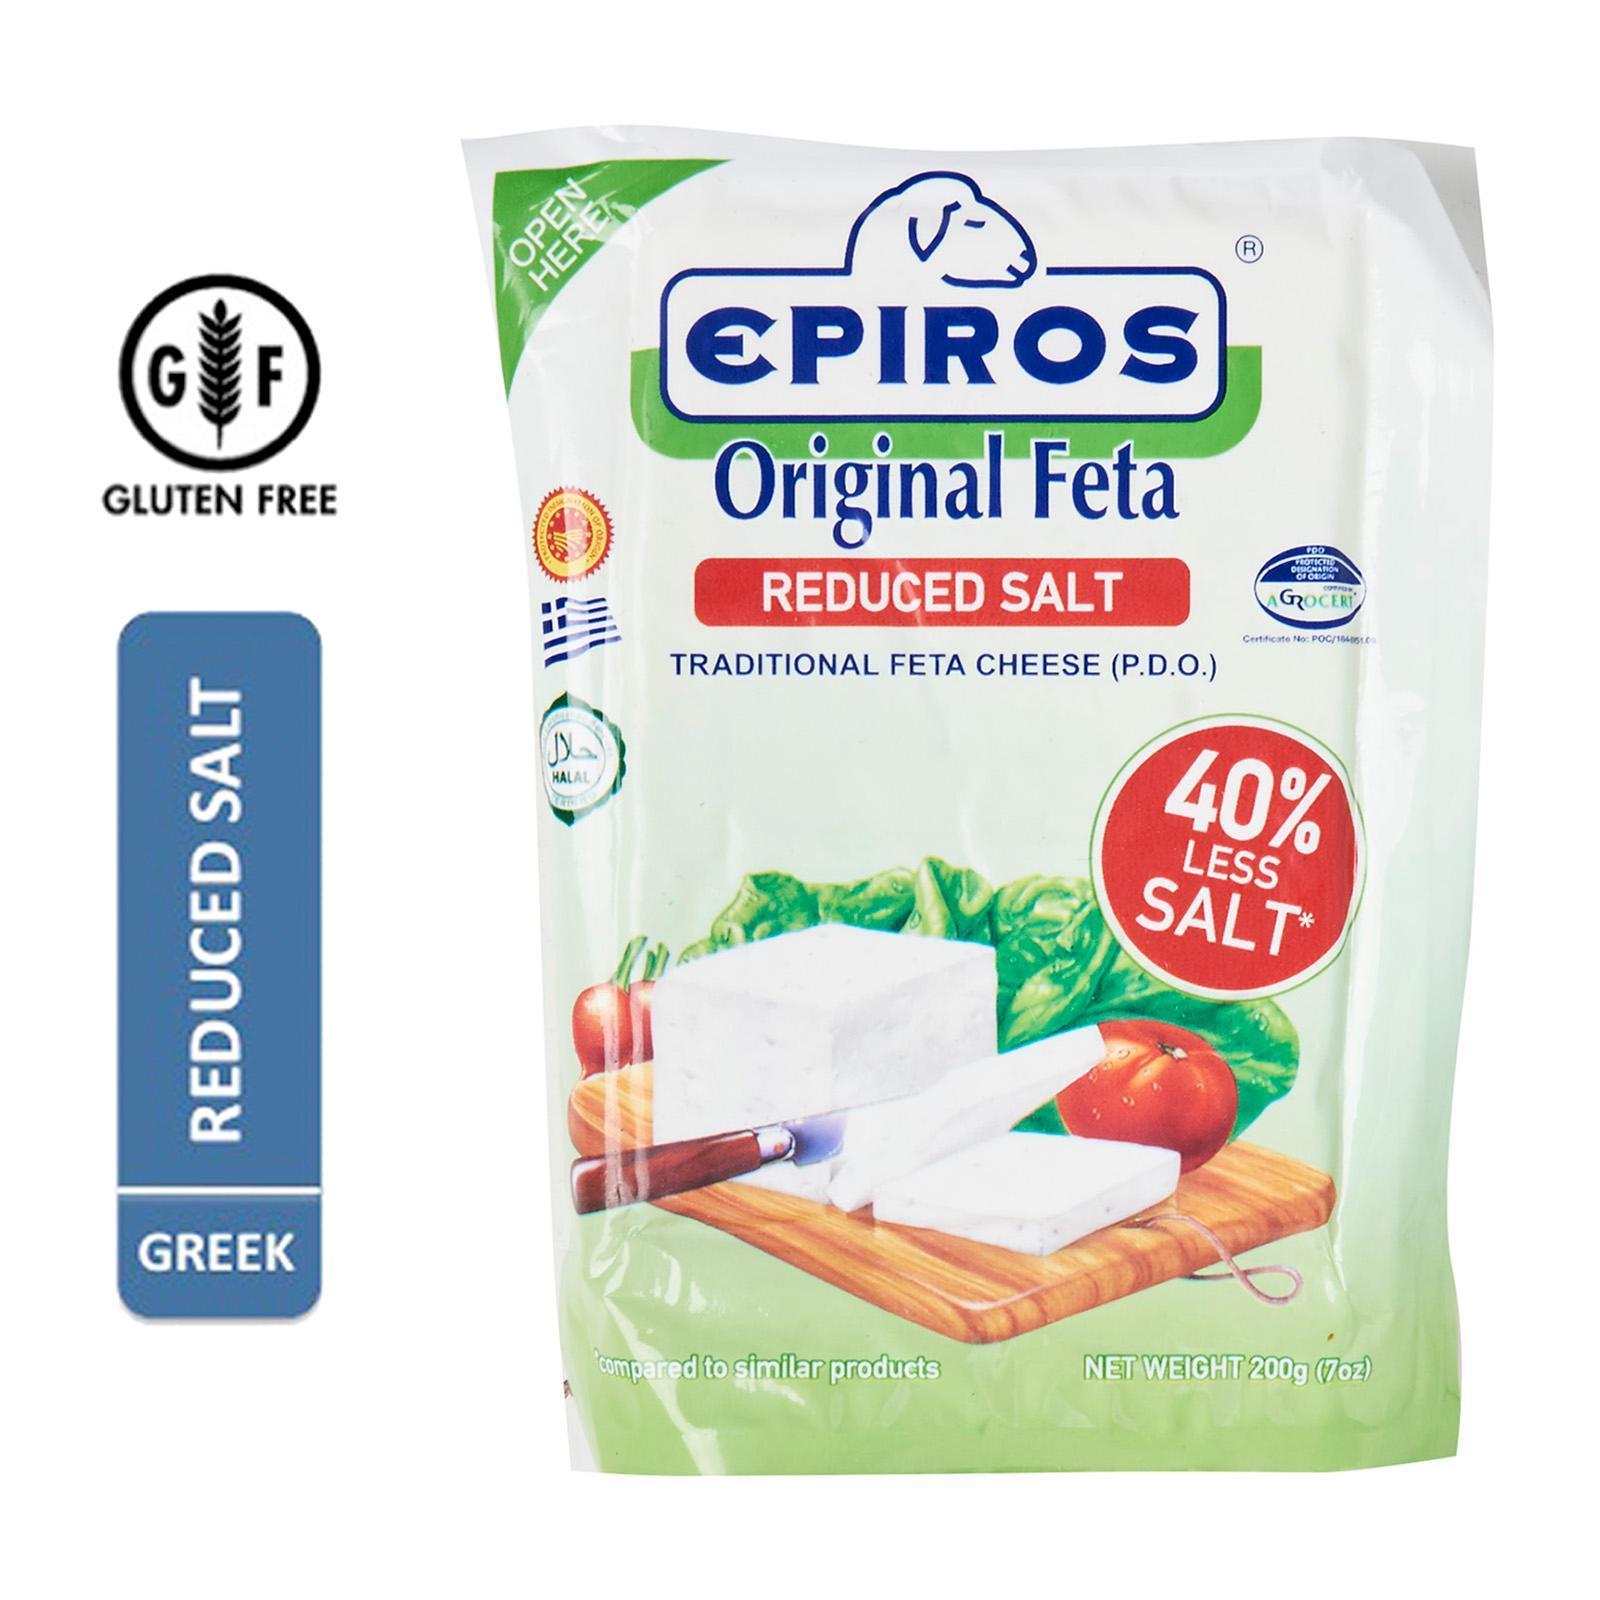 Epiros Original Greek Feta Cheese (PDO) Reduced Salt - By Agora Products